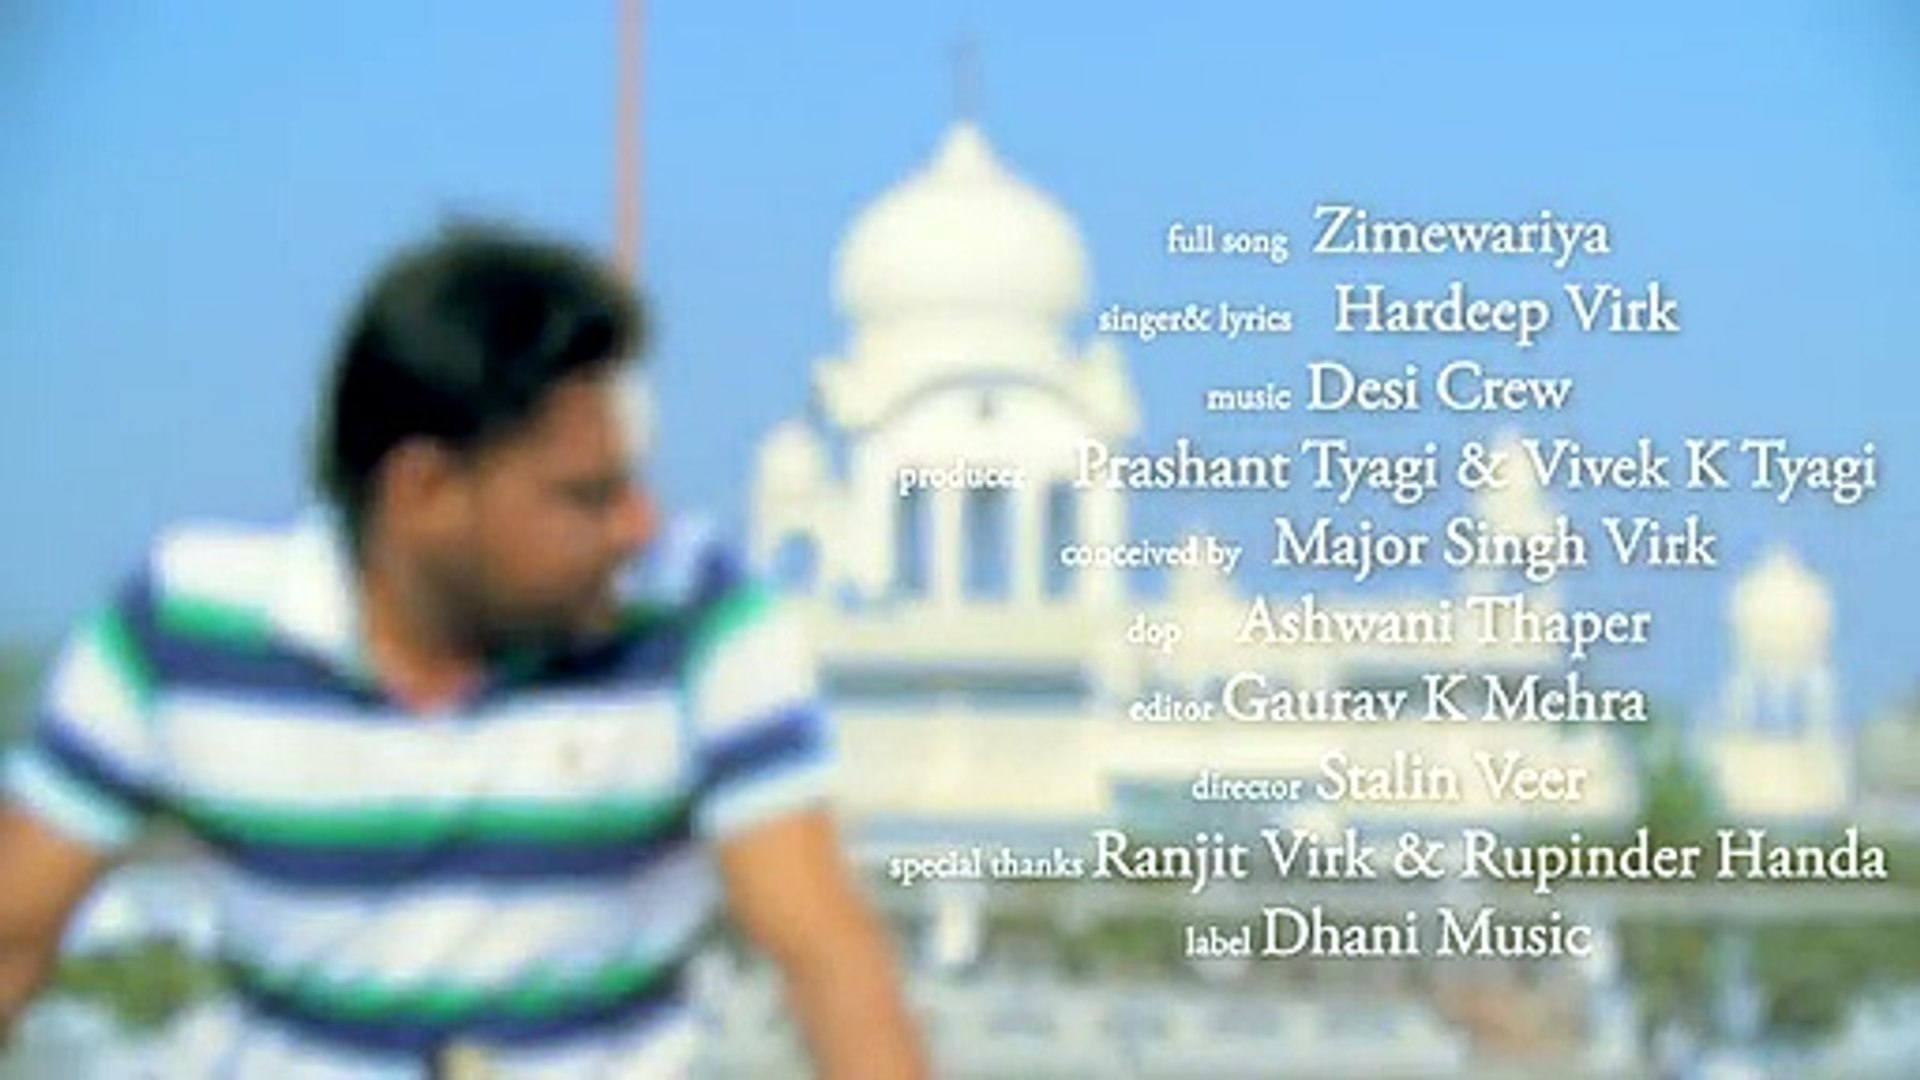 New Punjabi Songs 2015 Zimewariya By Hardeep Virk Latest Punjabi Songs 2015 Punjabi Songs - Video Da